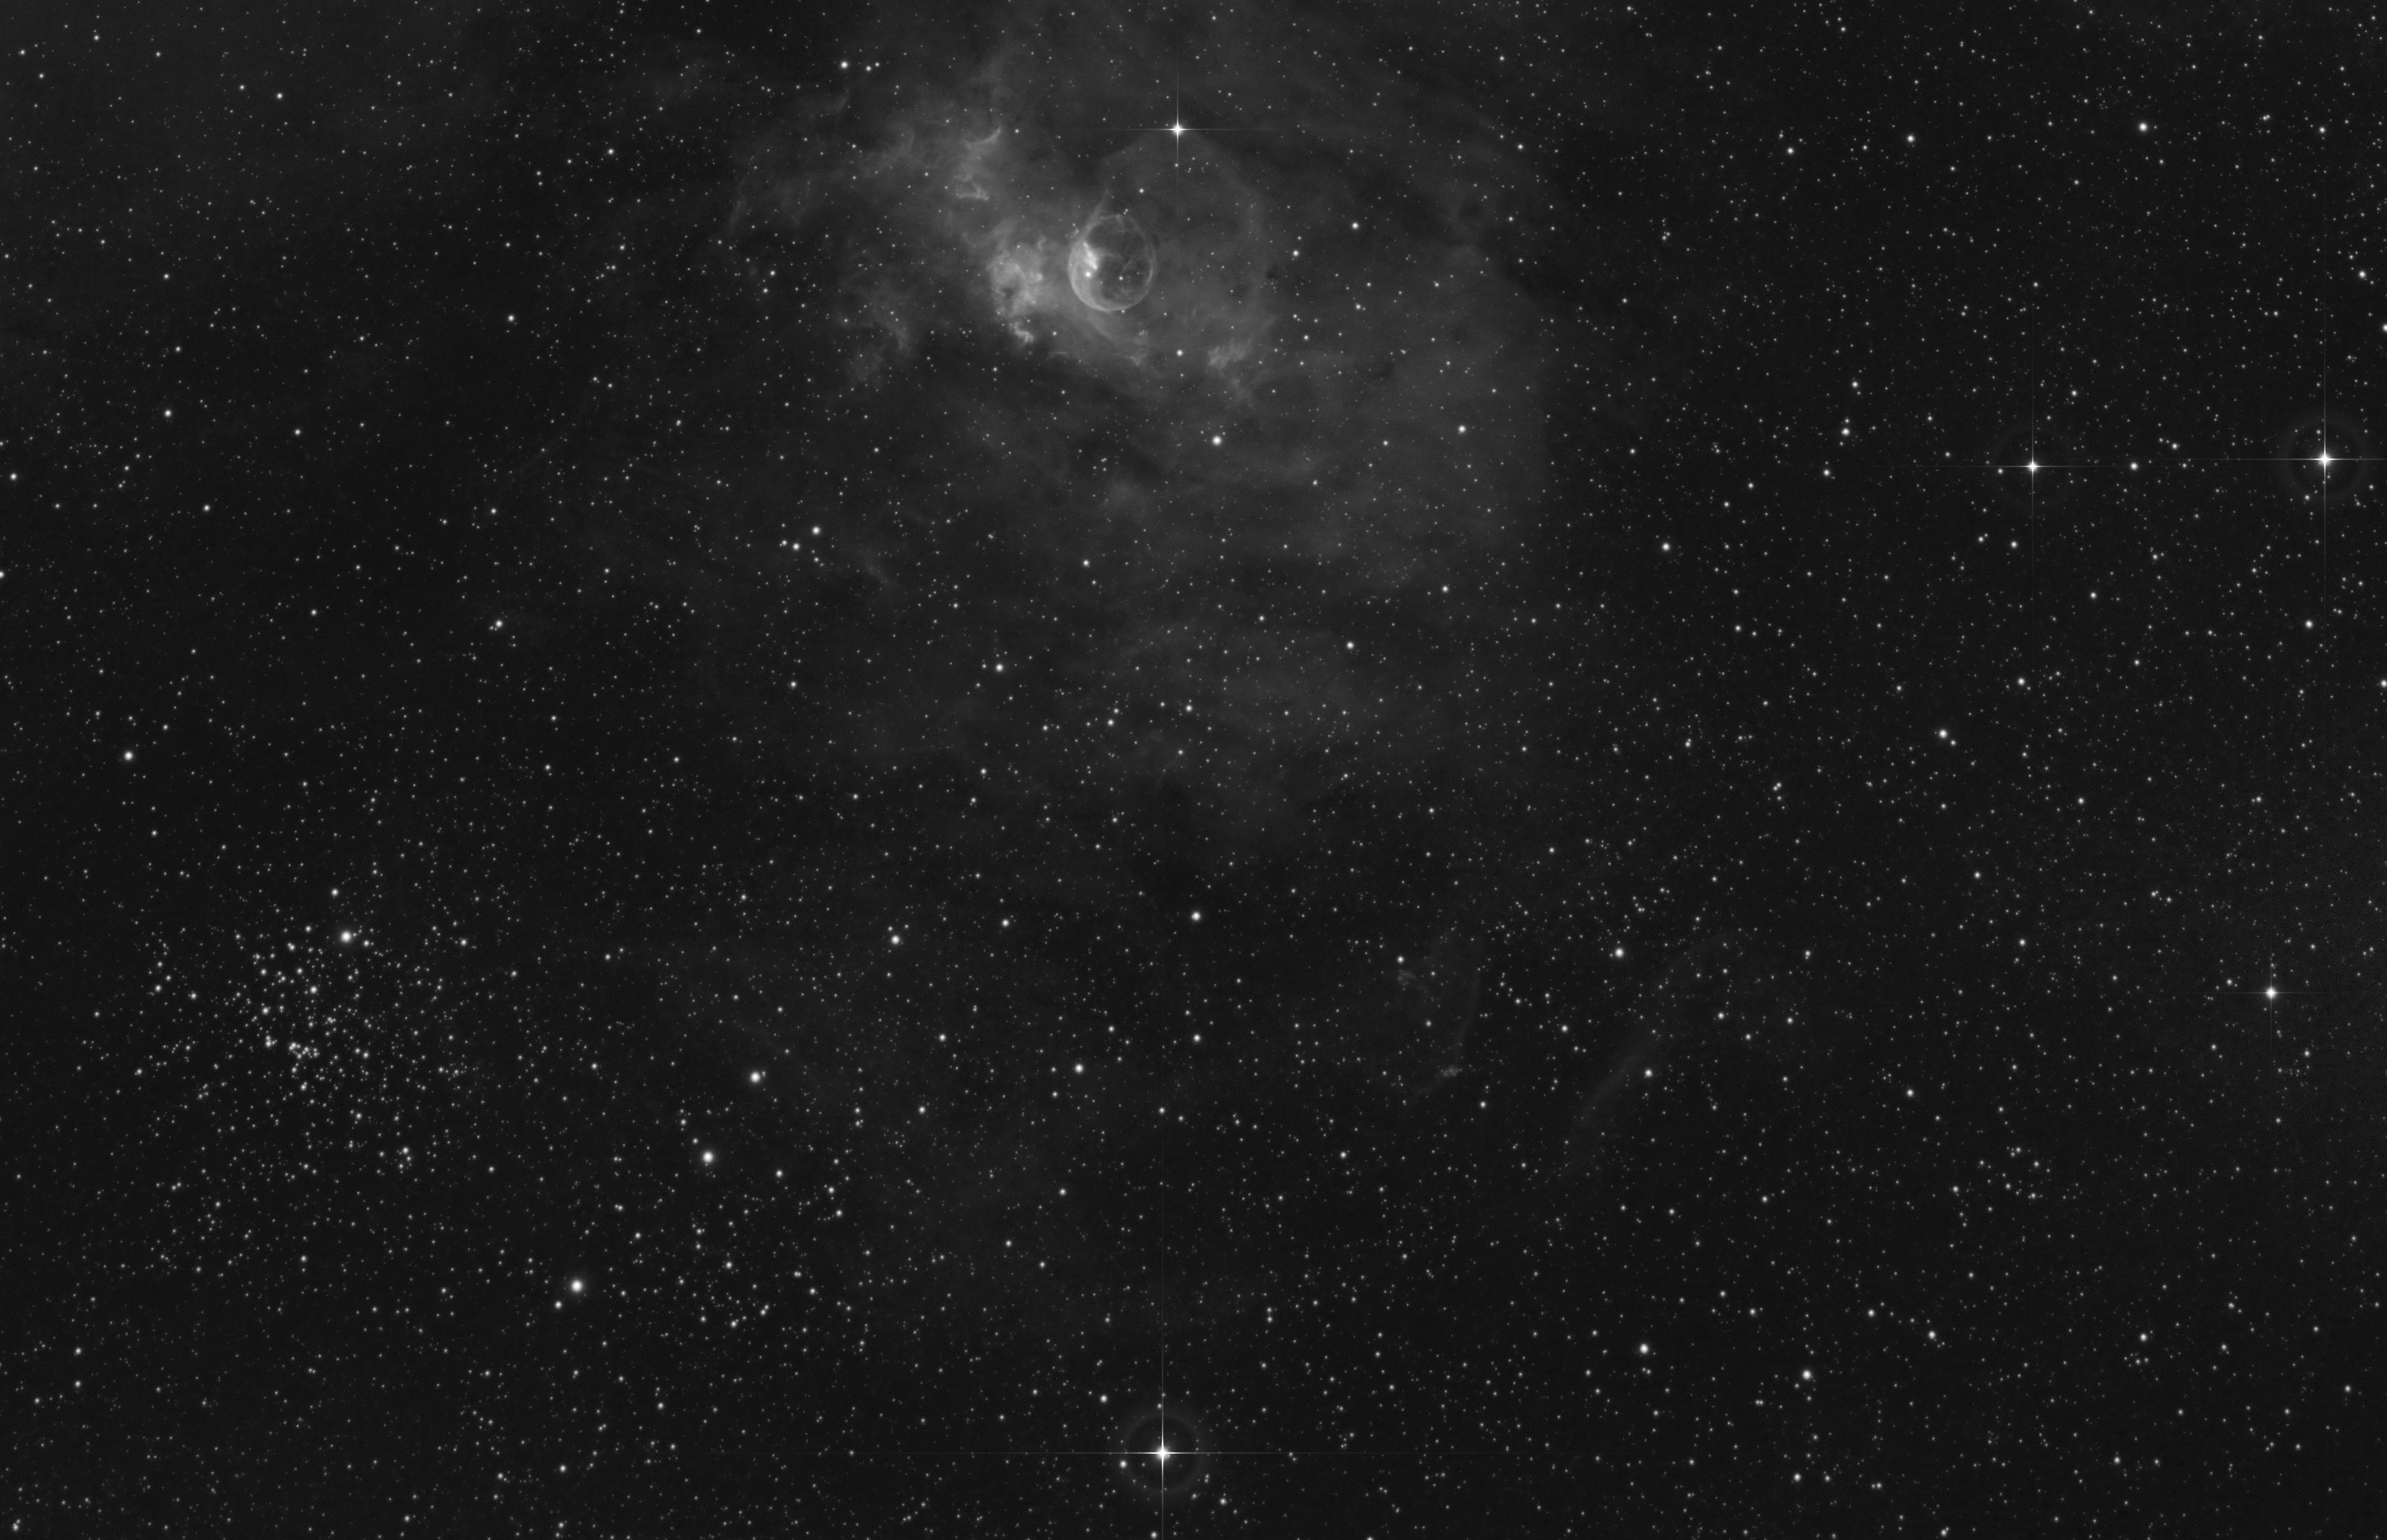 NGC7635_50x180s_Ha6nmb.jpg